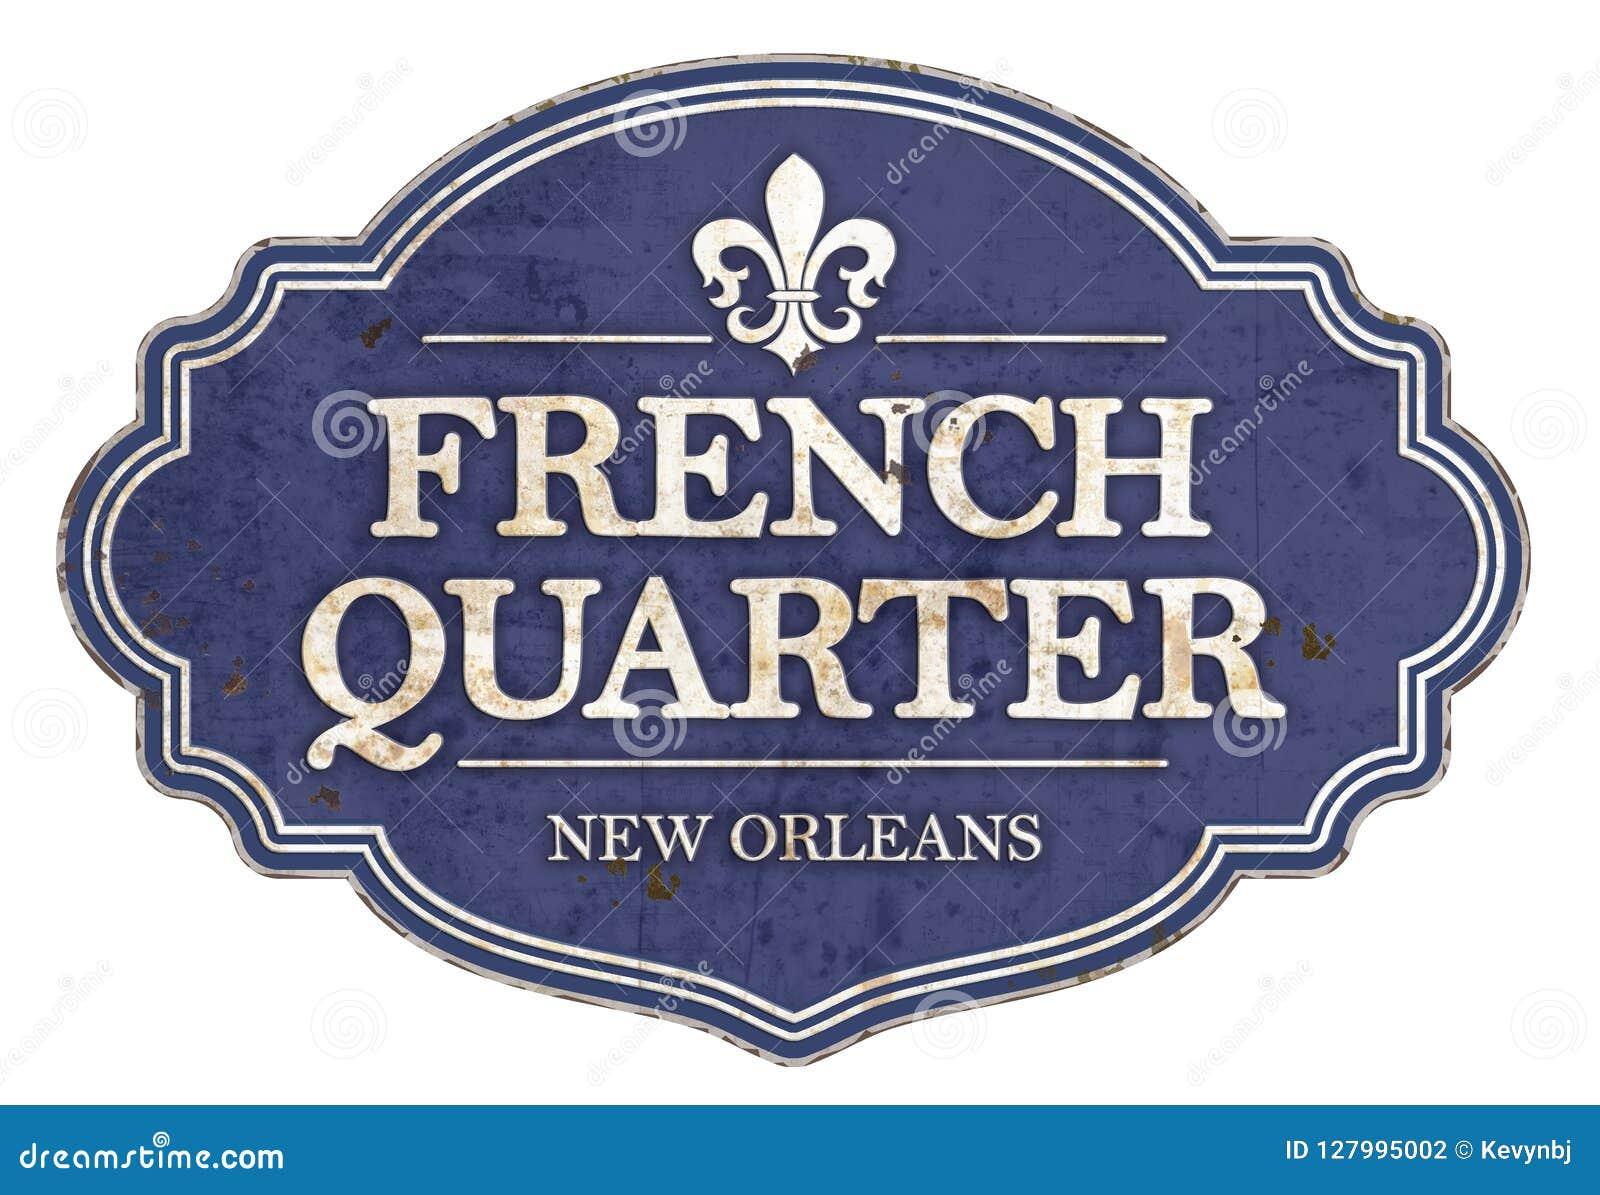 French Quarter New Orleans Enamel Sign Vintage Retro